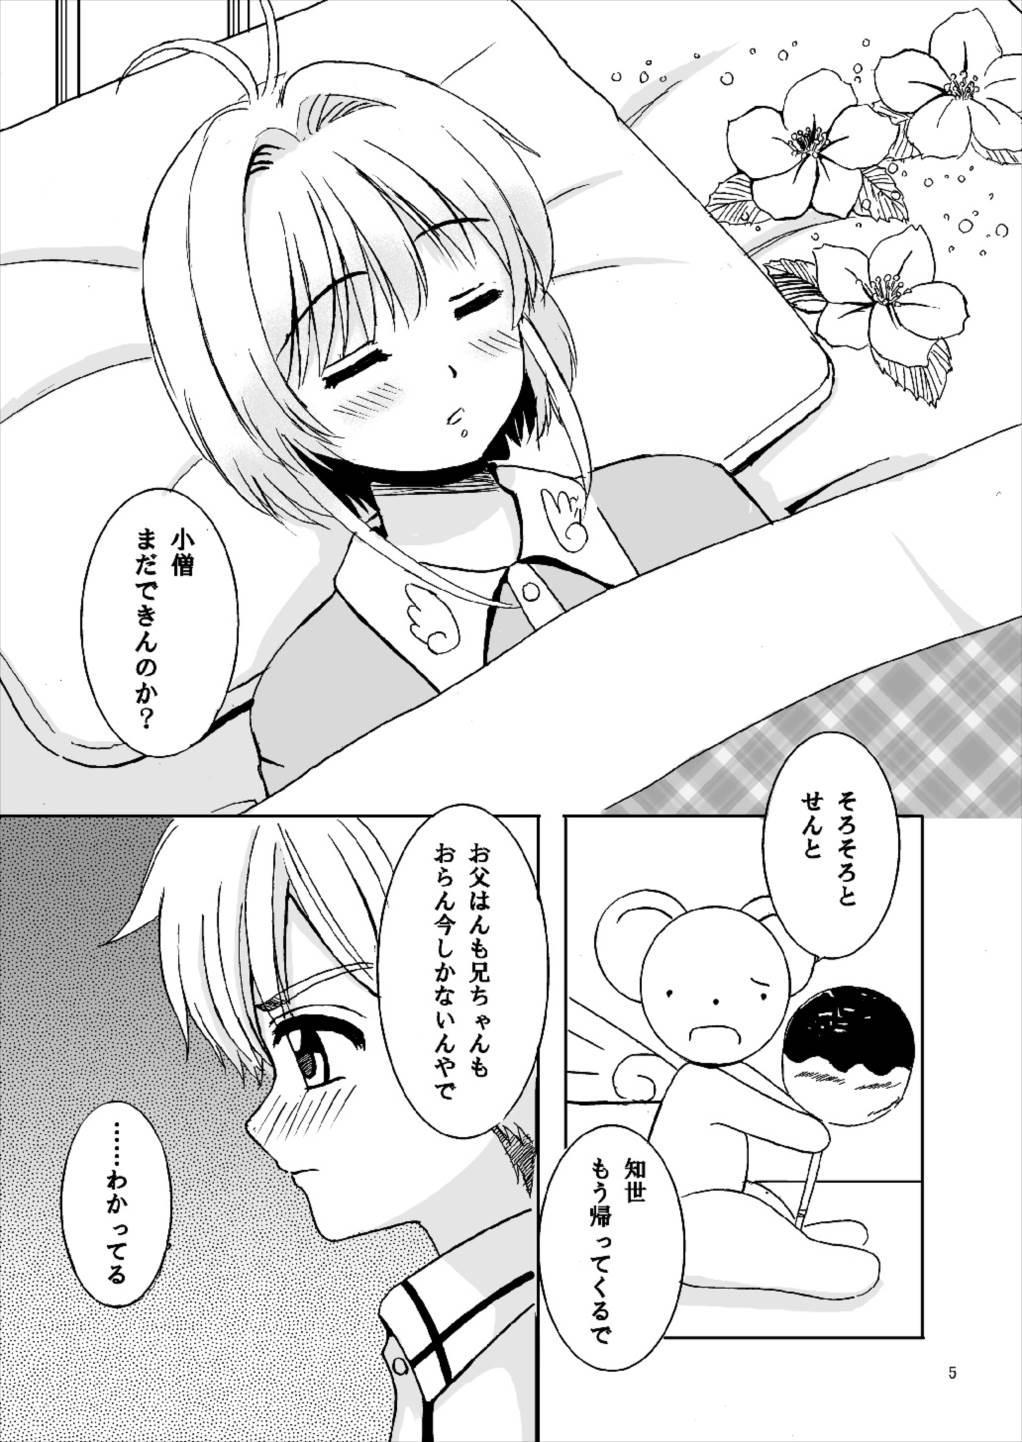 Sakura to Issho! 4